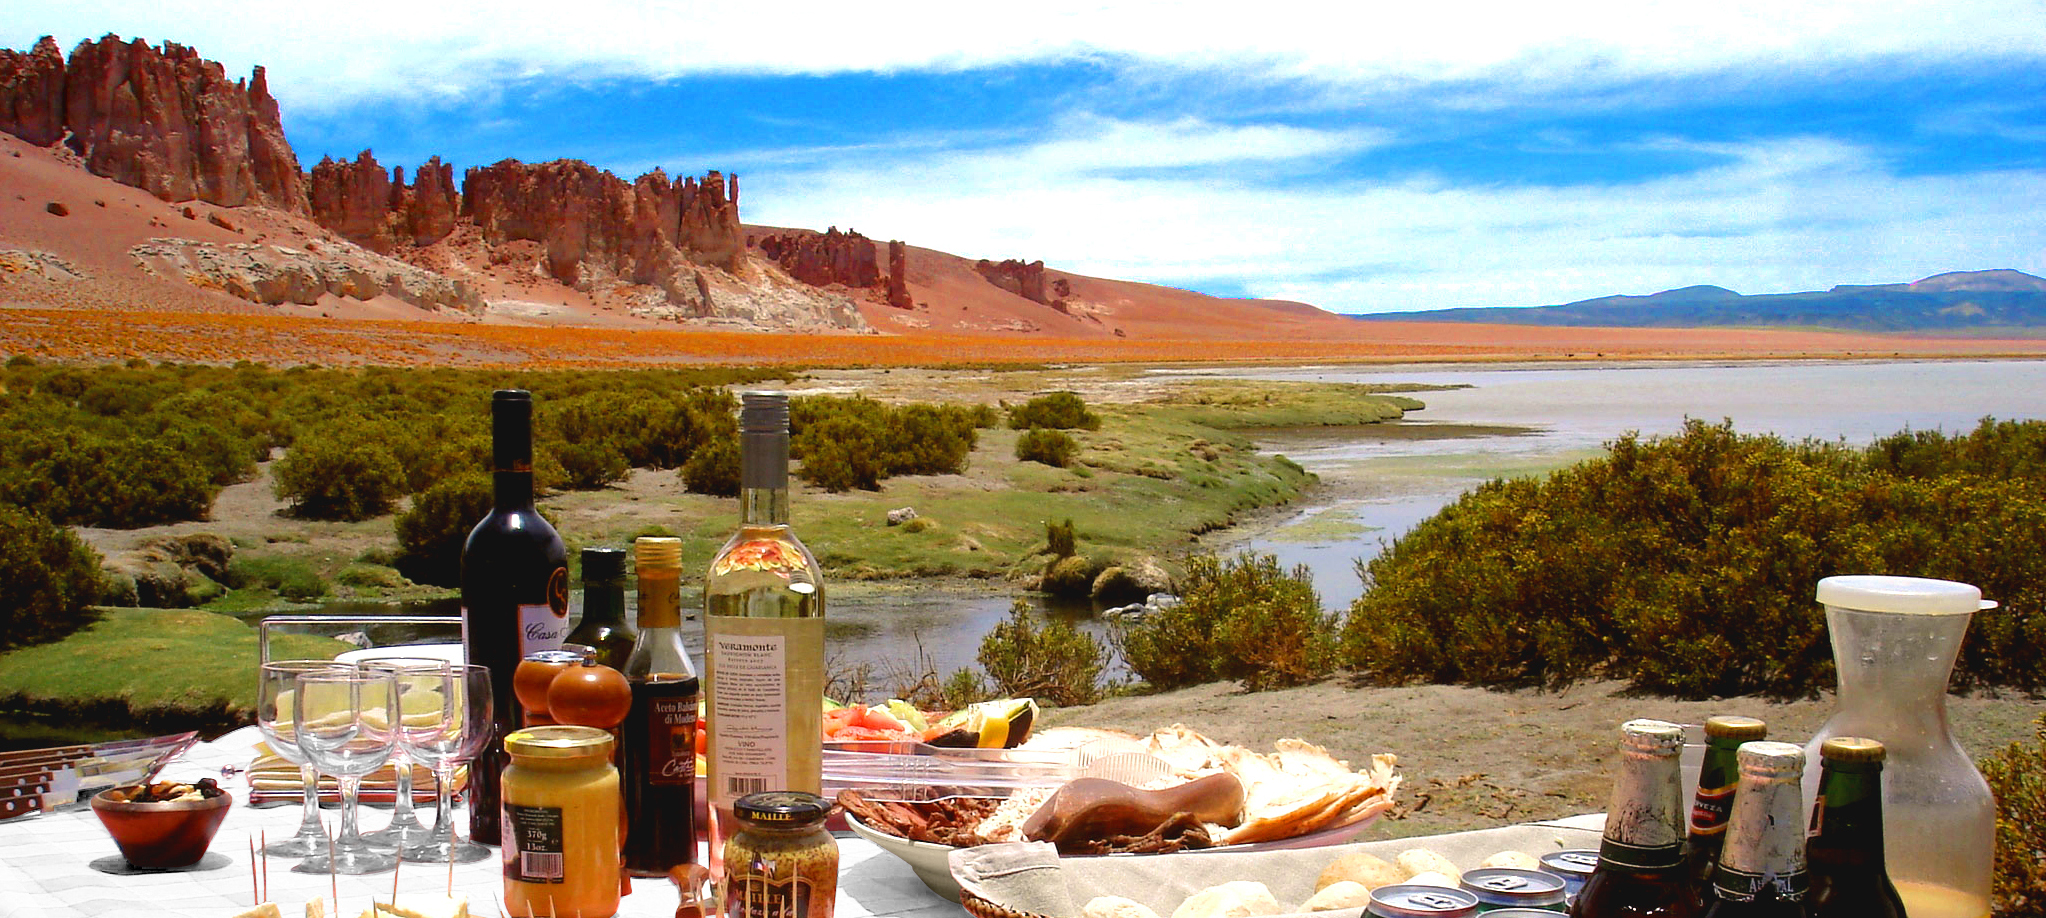 guided-atacama-desert-excursions